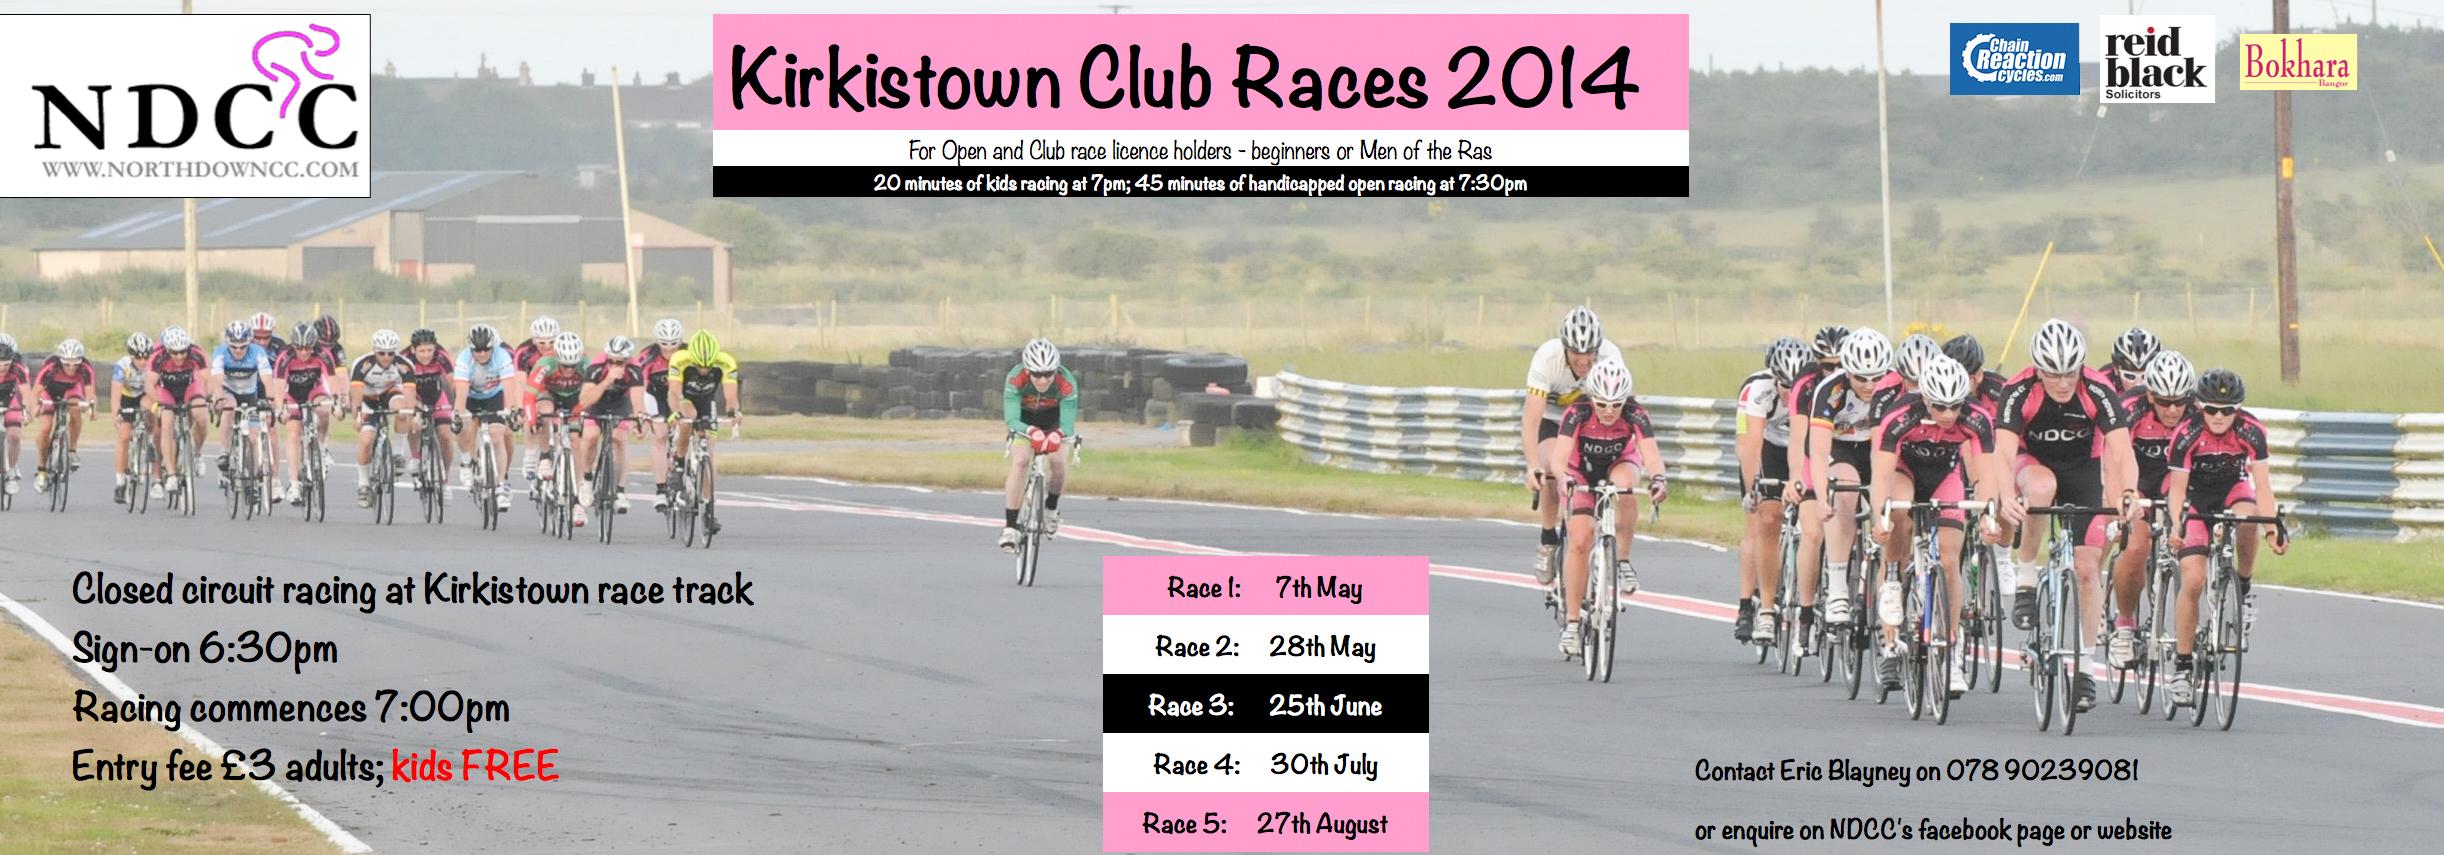 Kirkistown Club Races 2014